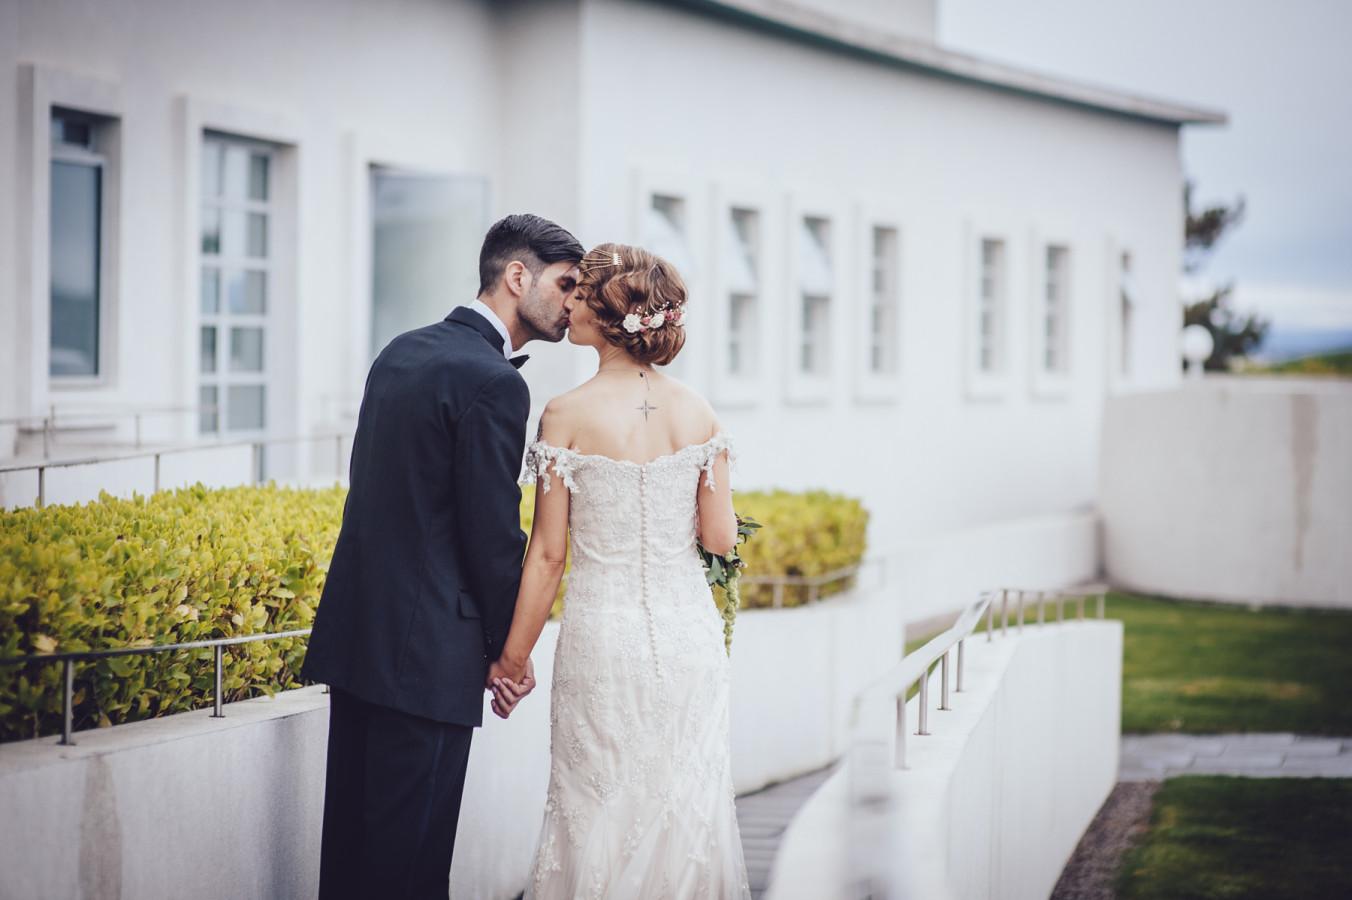 Vintage wedding at the midland hotel, morecambe